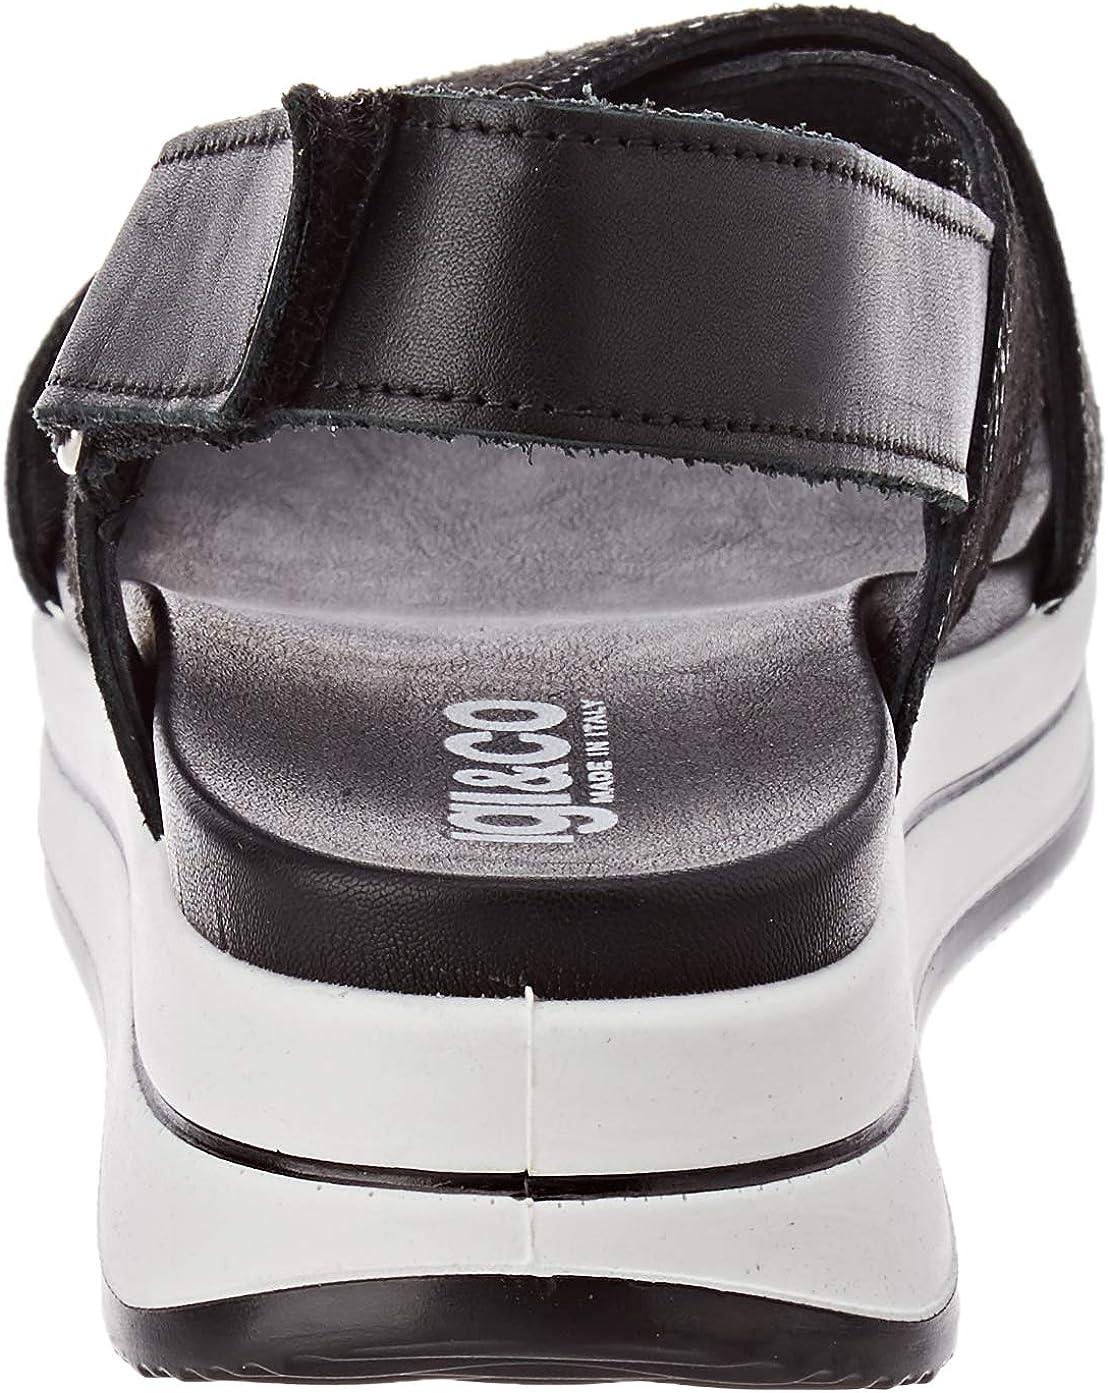 IGI&Co Damen Sandalo Donna Dsd 51743 Plateau Sandalen Schwarz Nero 5174300